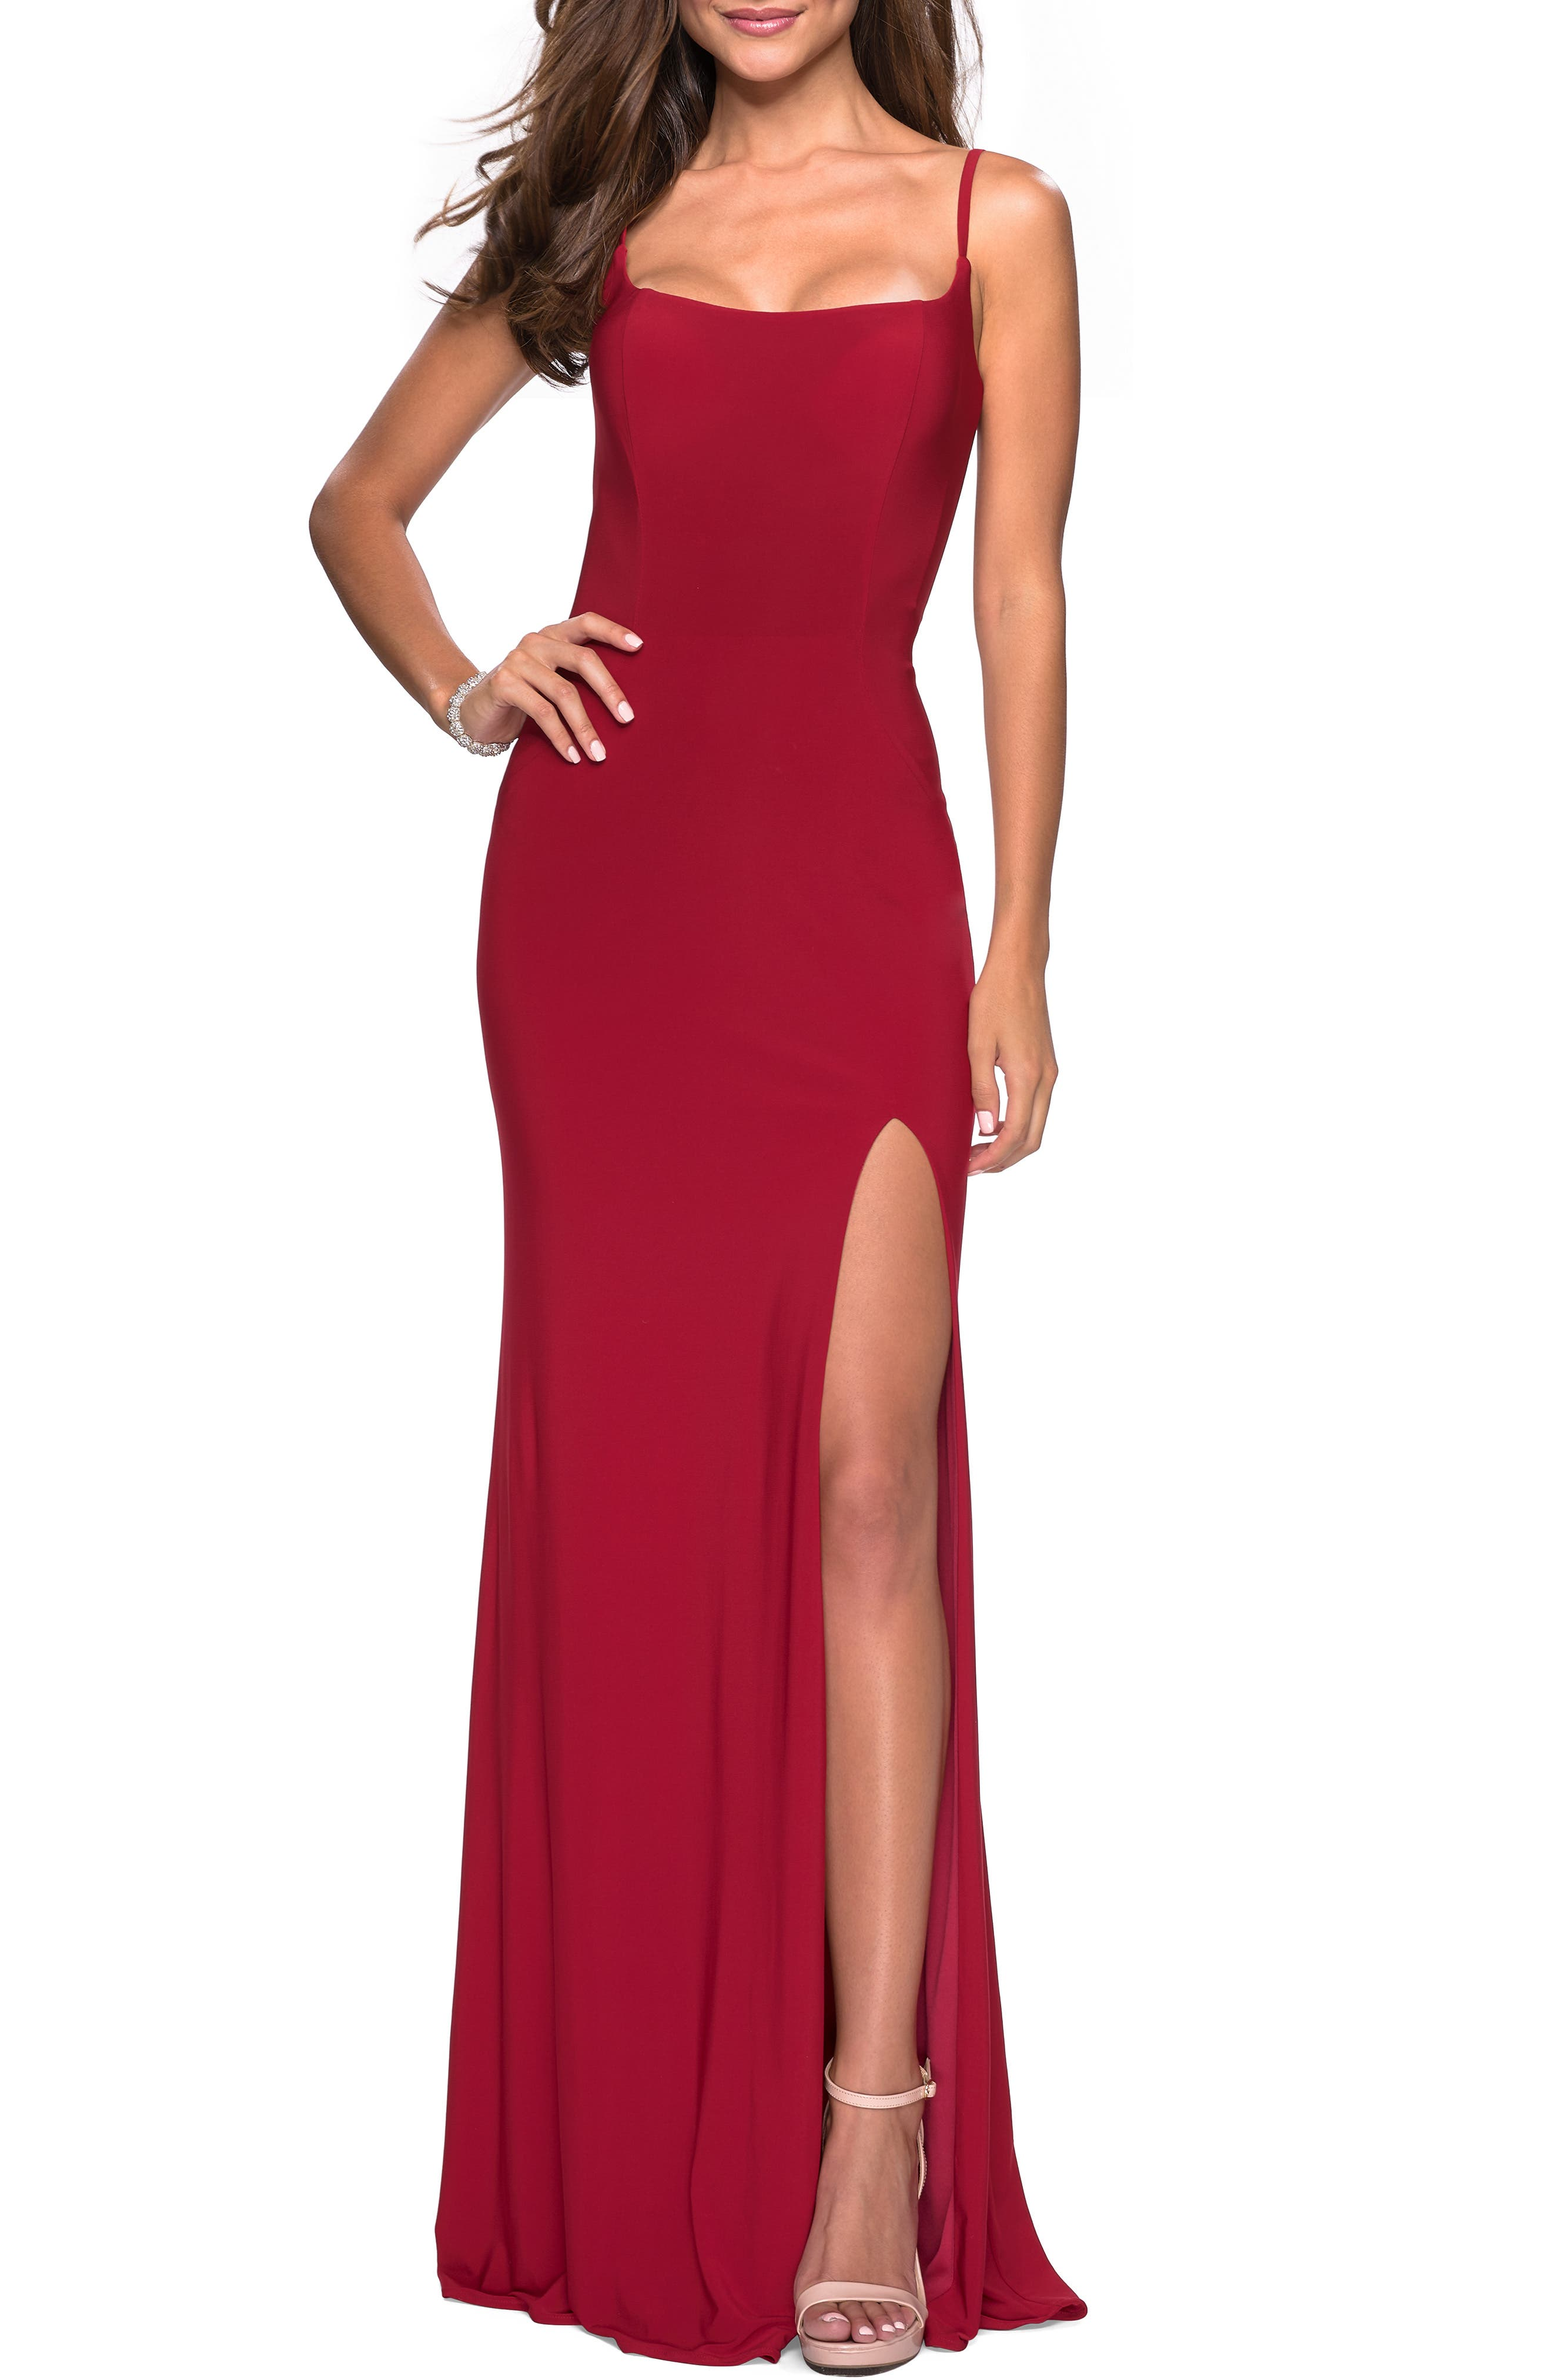 La Femme Strappy Back Jersey Evening Dress, Red